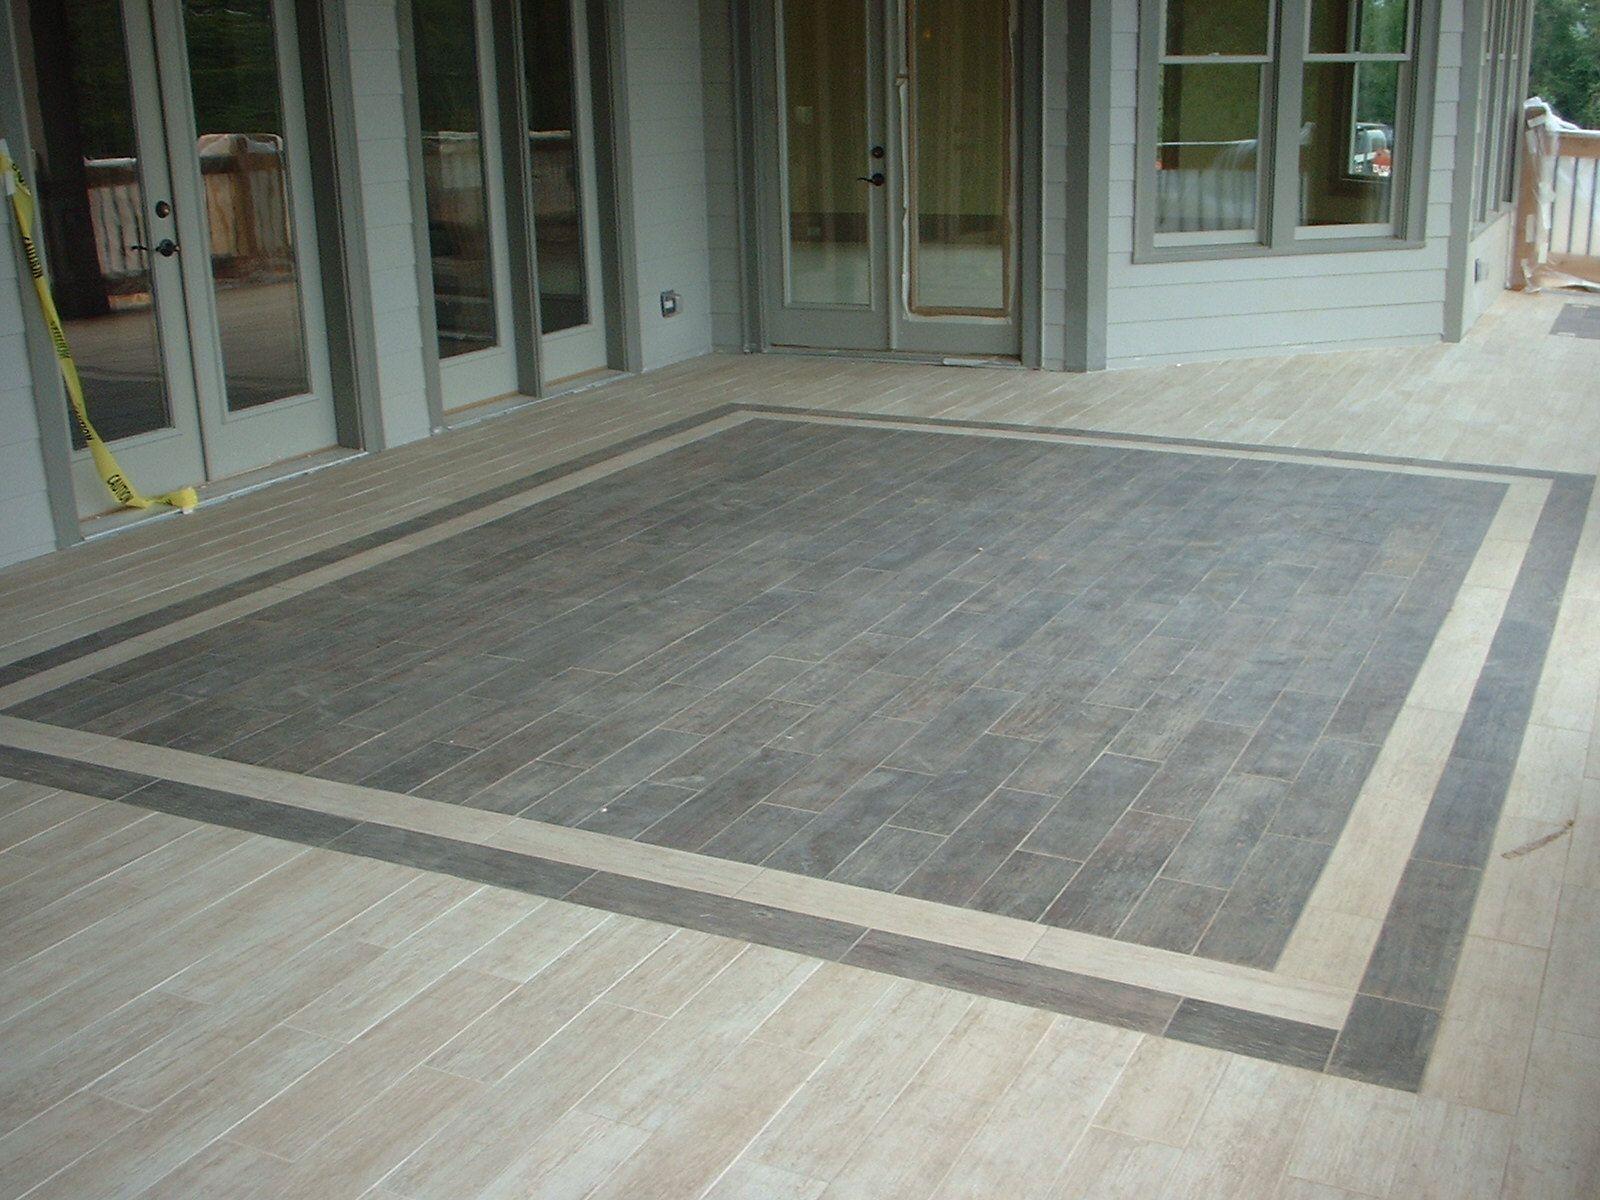 Car porch floor tiles design malaysia the ground beneath her feet gray porcelain tile patio modern pavers pinterest porcelain tile porcelain and patios dailygadgetfo Gallery